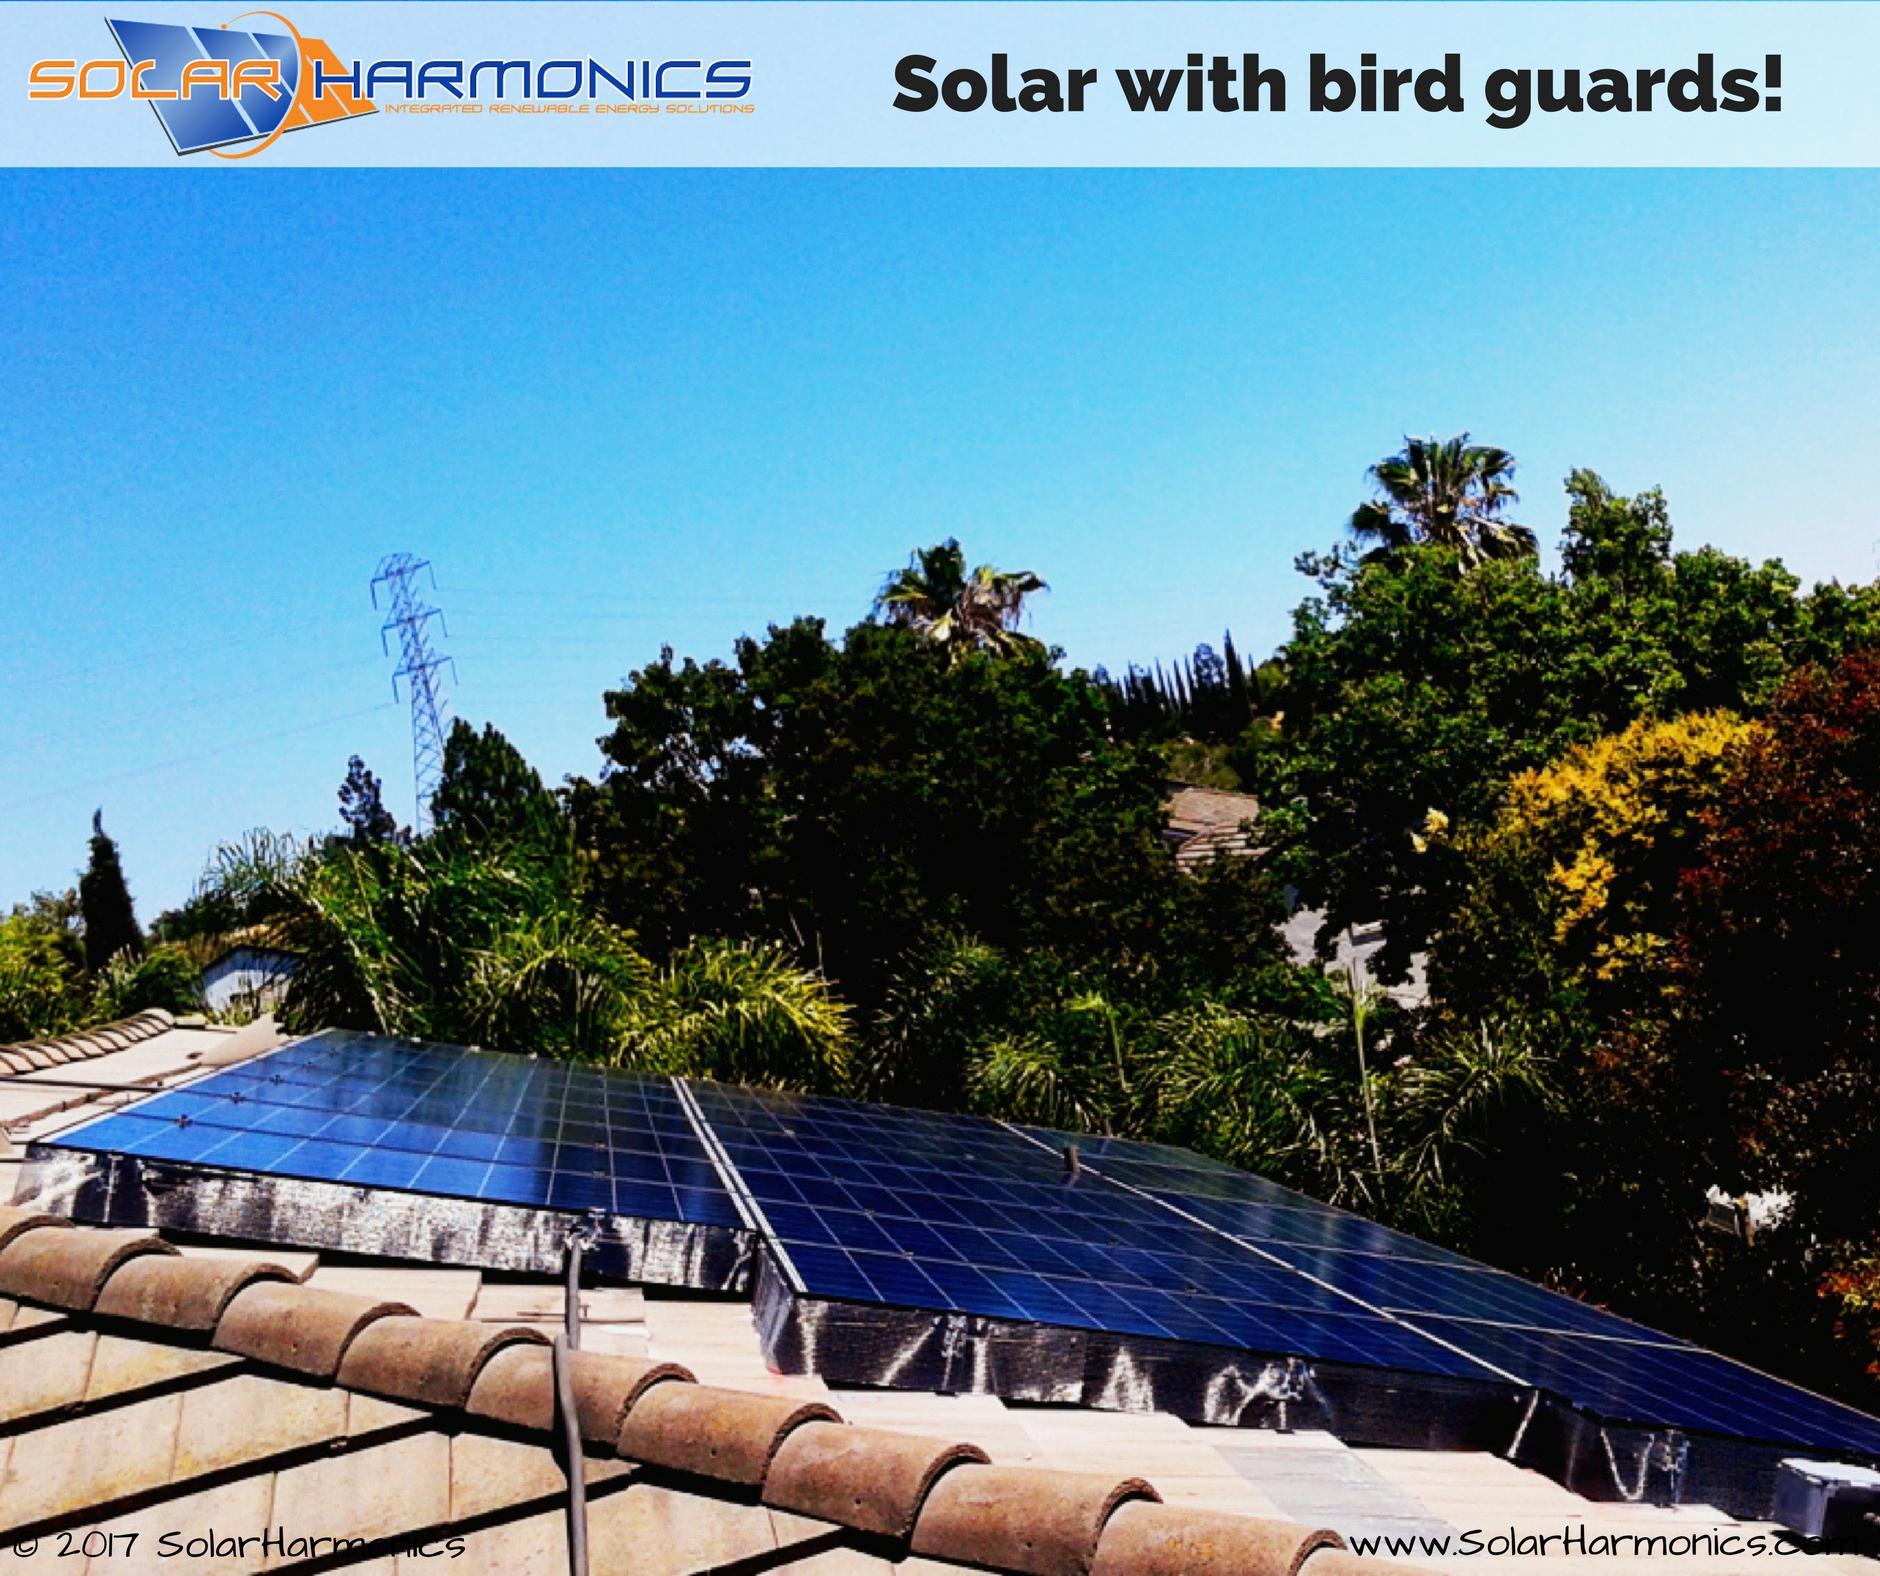 Solar With Bird Guards Antioch Panel Installation Solar Installation Solar Solar Projects